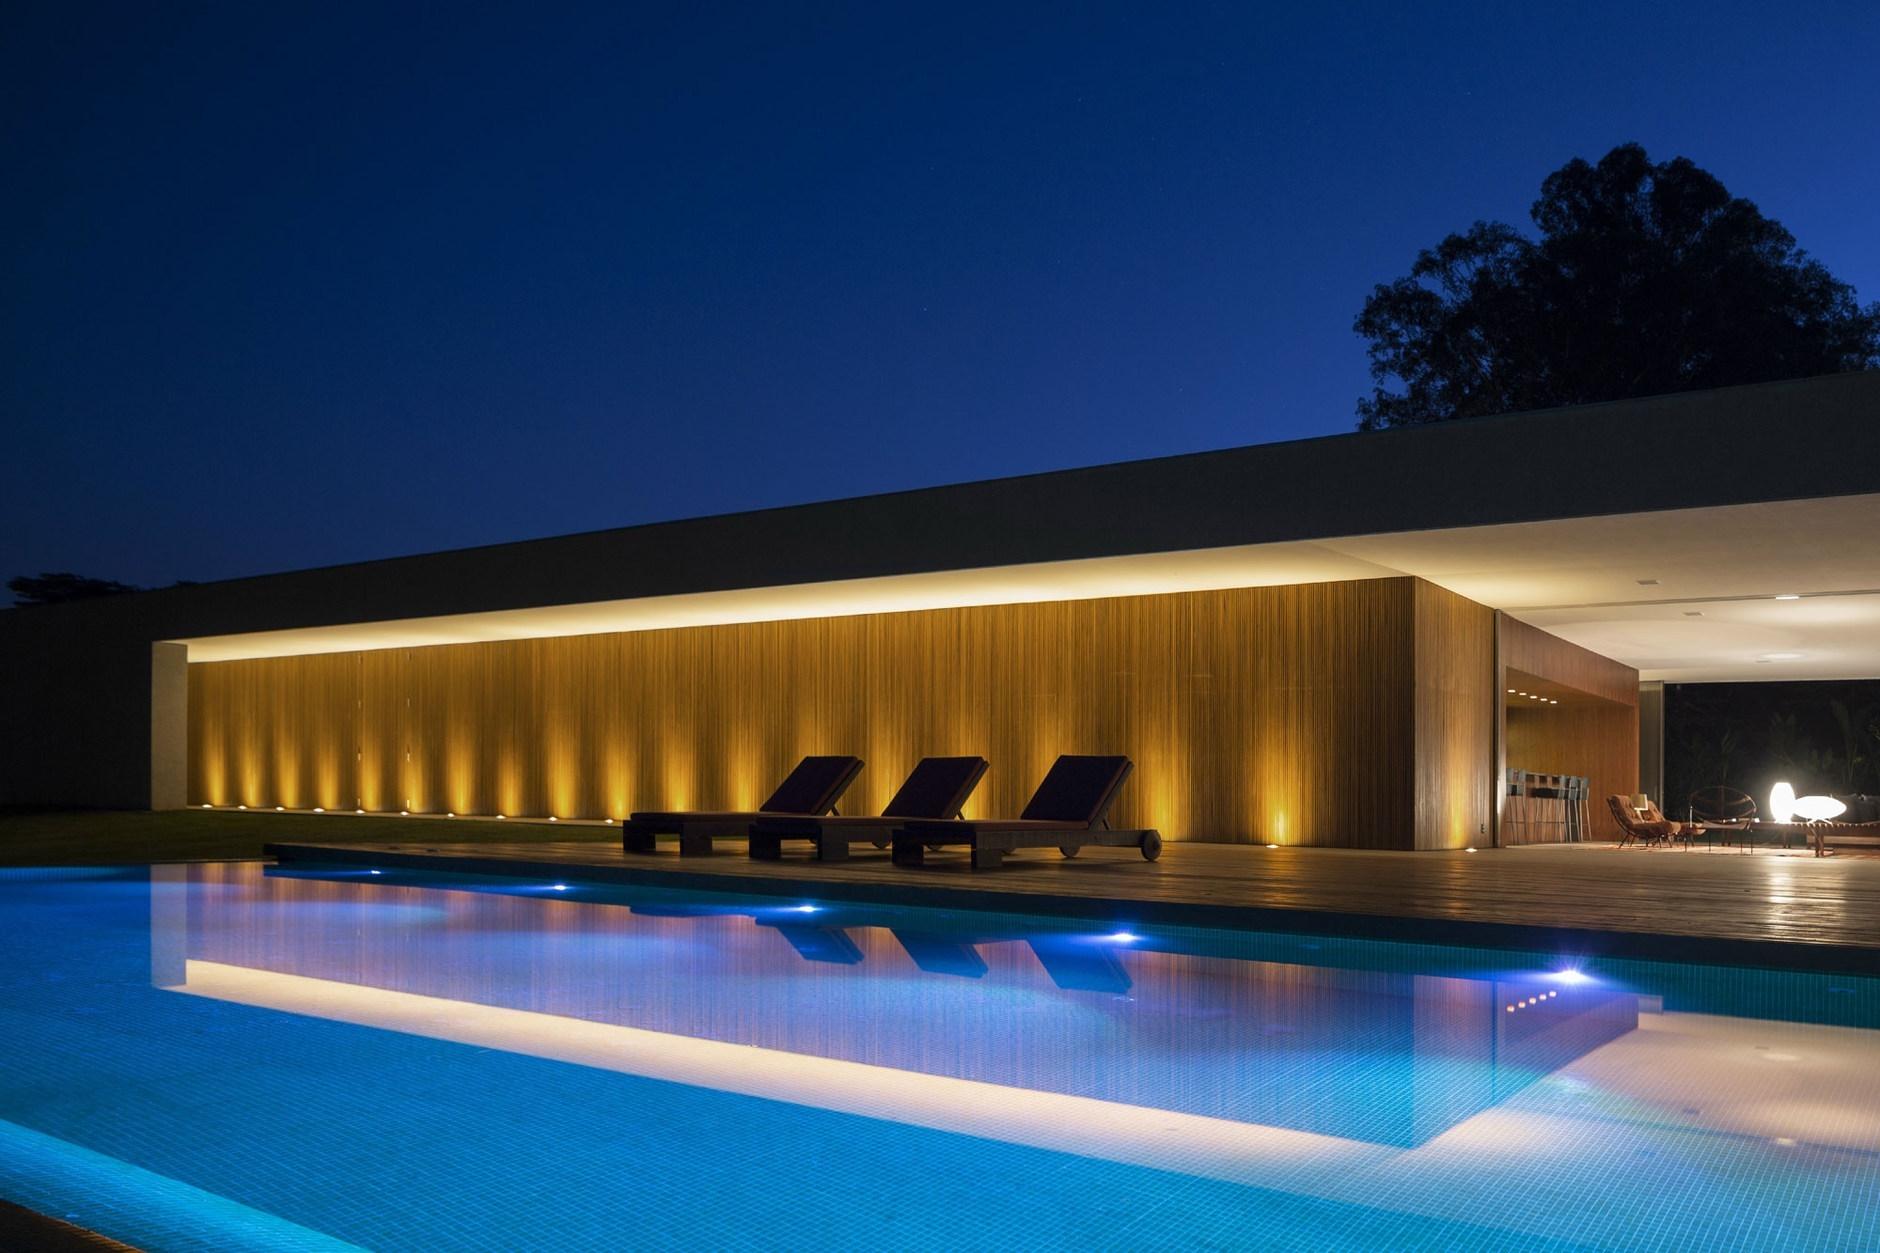 Lee House By Studio Mk27 Marcio Kogan Eduardo Glycerio Karmatrendz